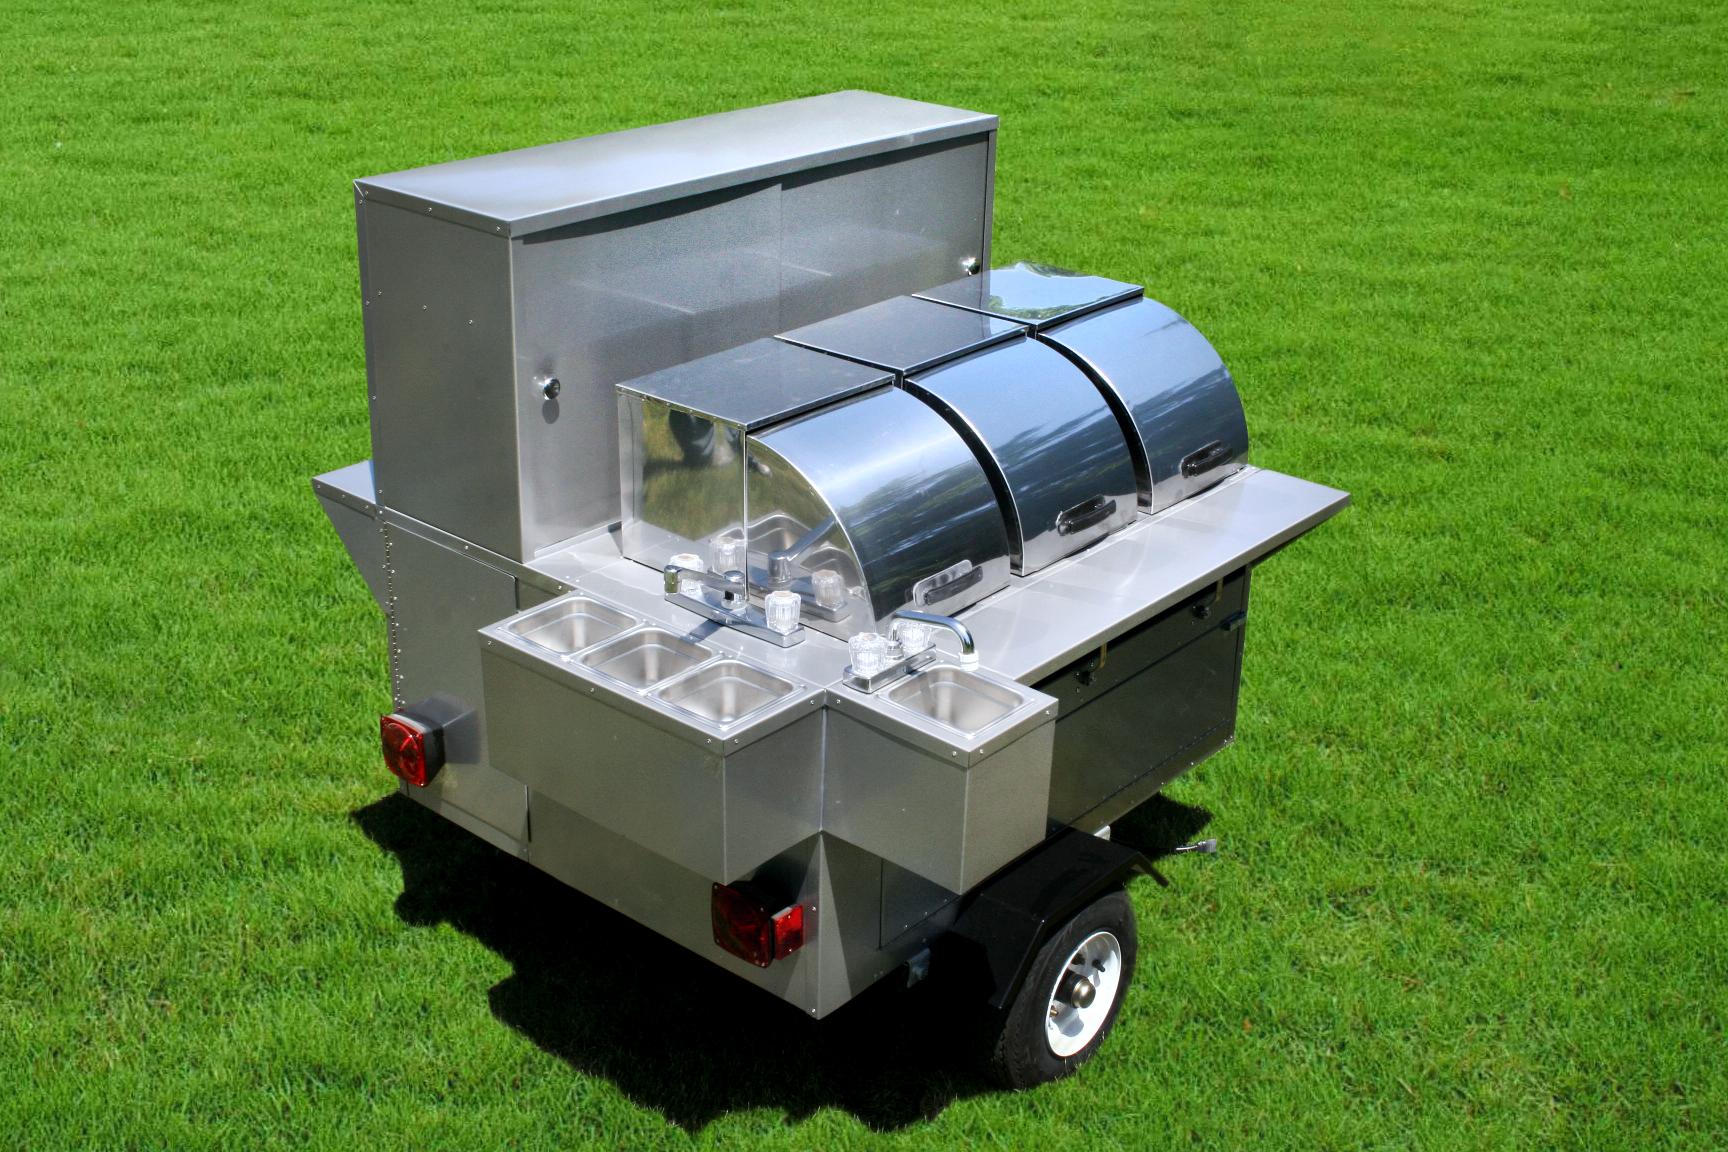 Lightning Bolt Hot Dog Cart 3 Steam Tables Sinks